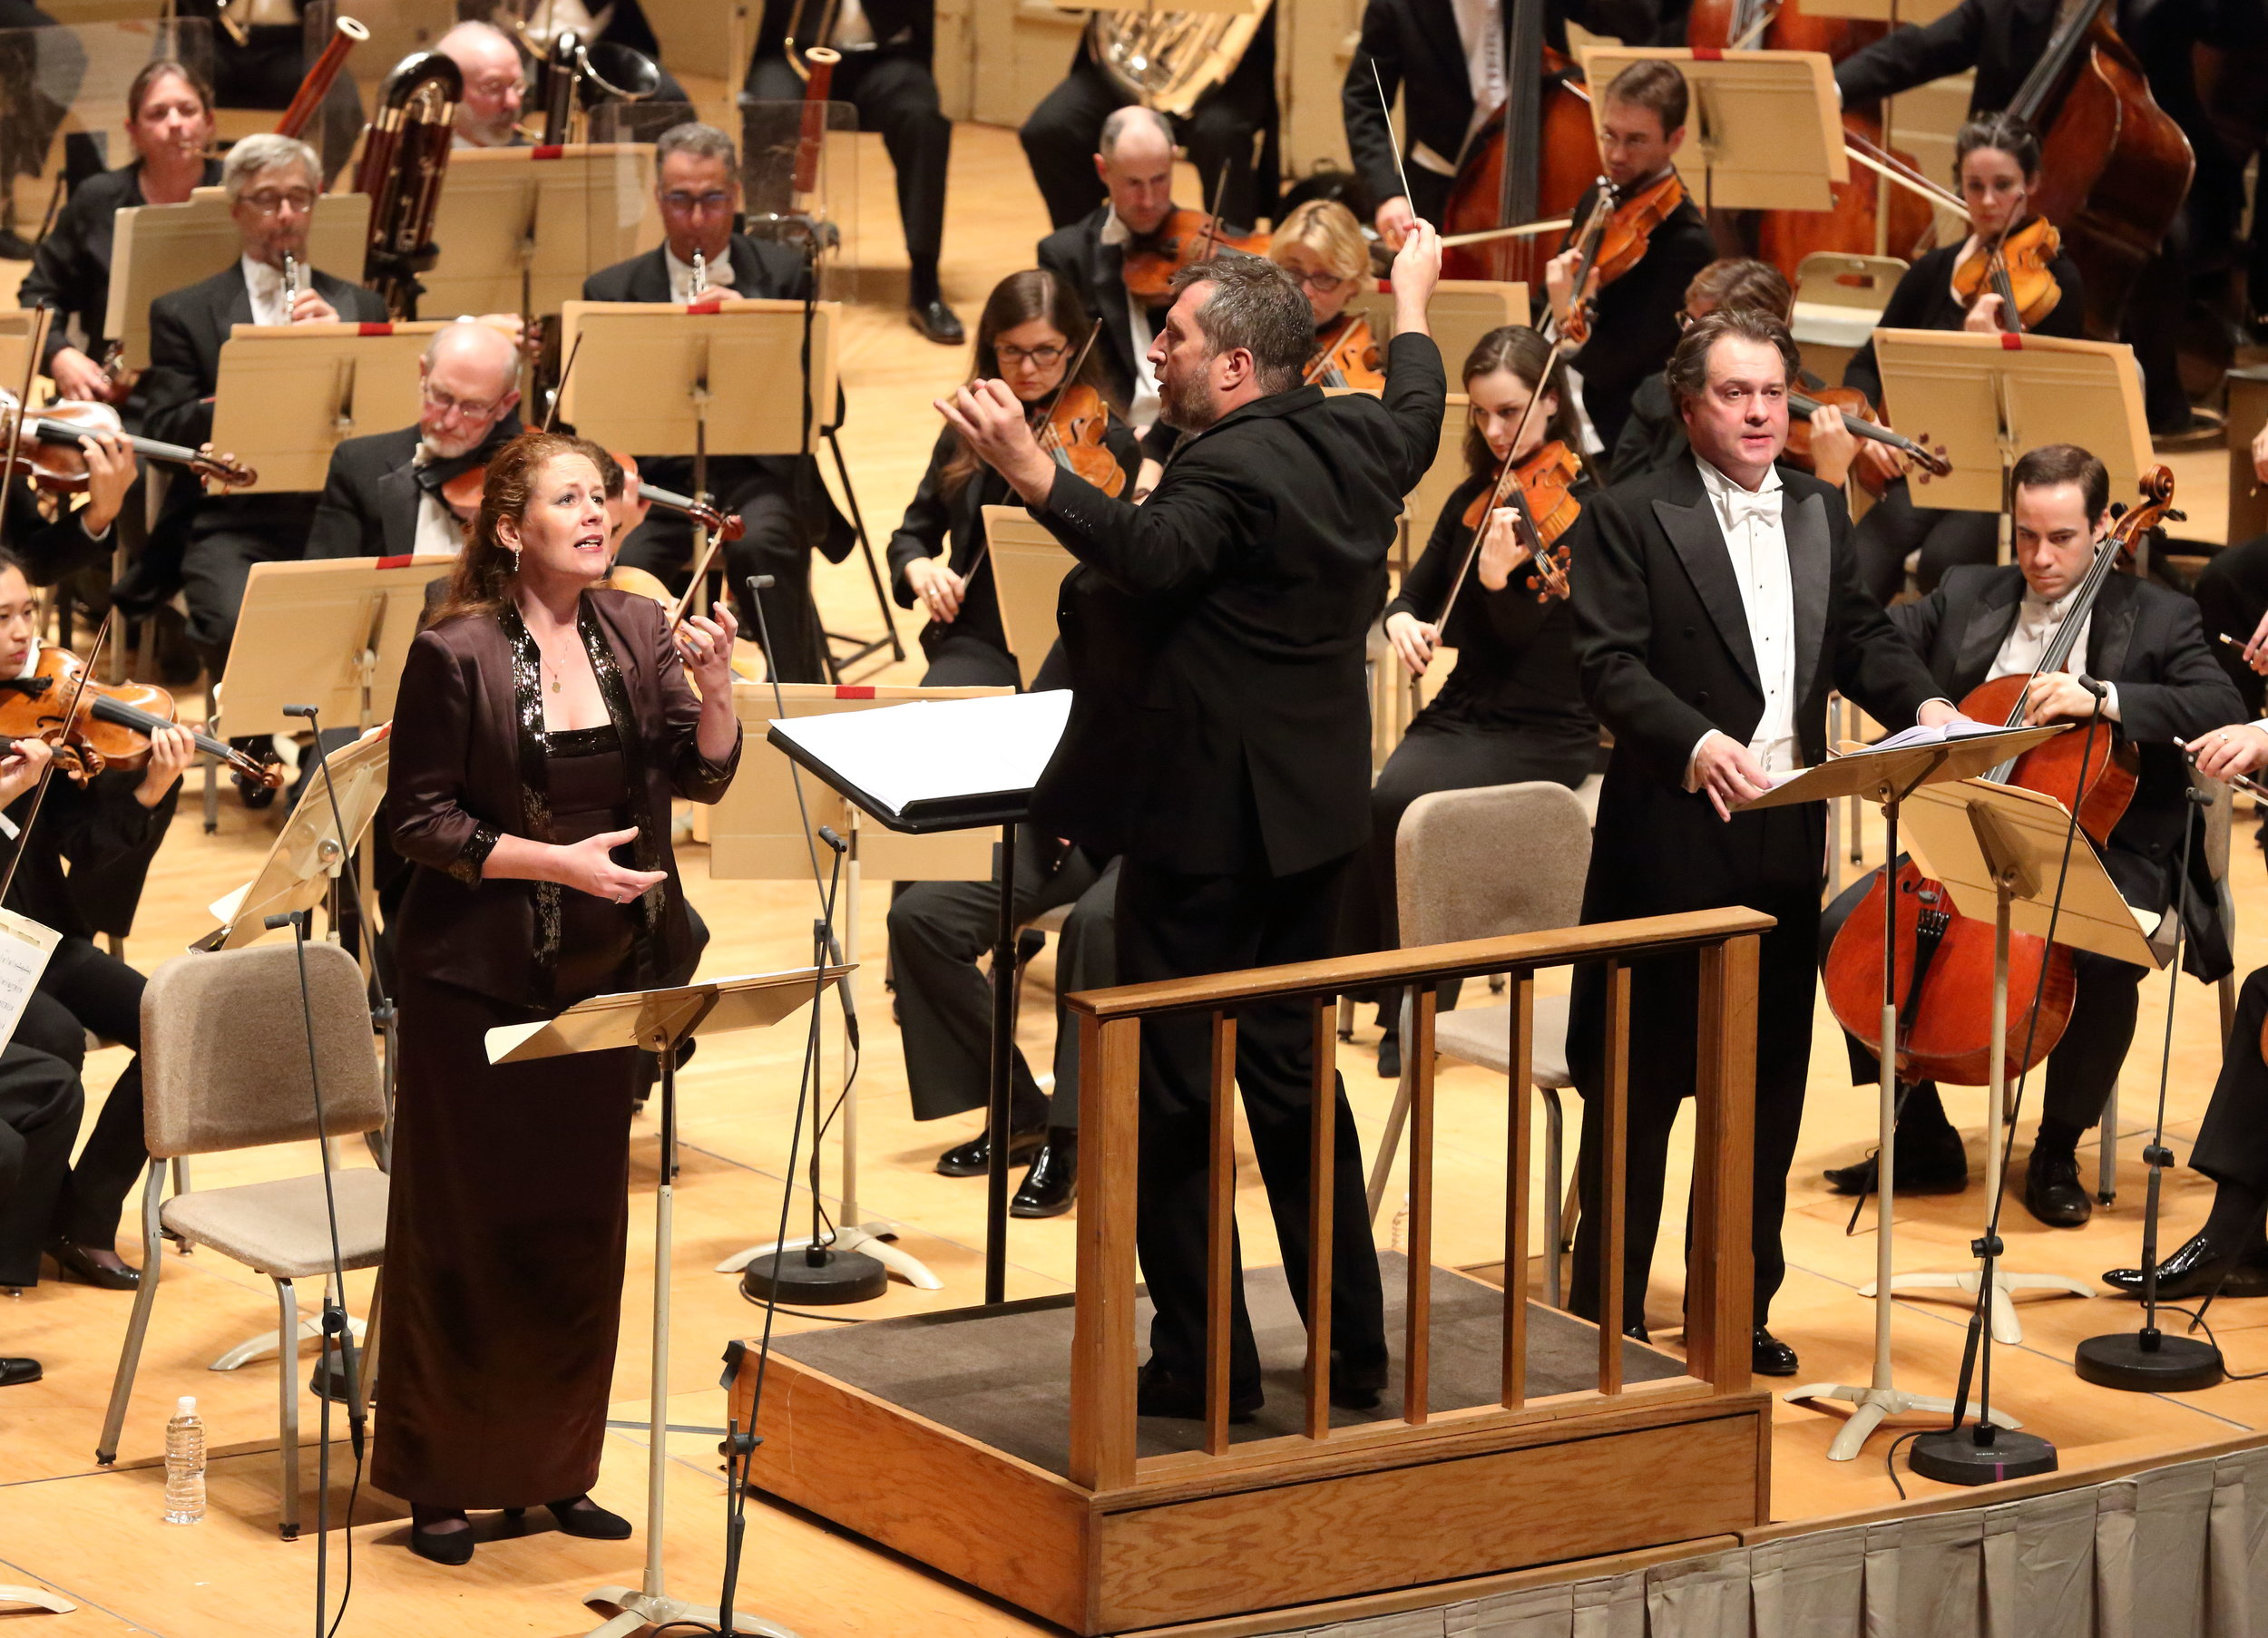 Thomas Adès conducts the Boston Symphony Orchestra, with mezzo Christianne Stotijn and baritone Mark Stone. 3 November 2016.